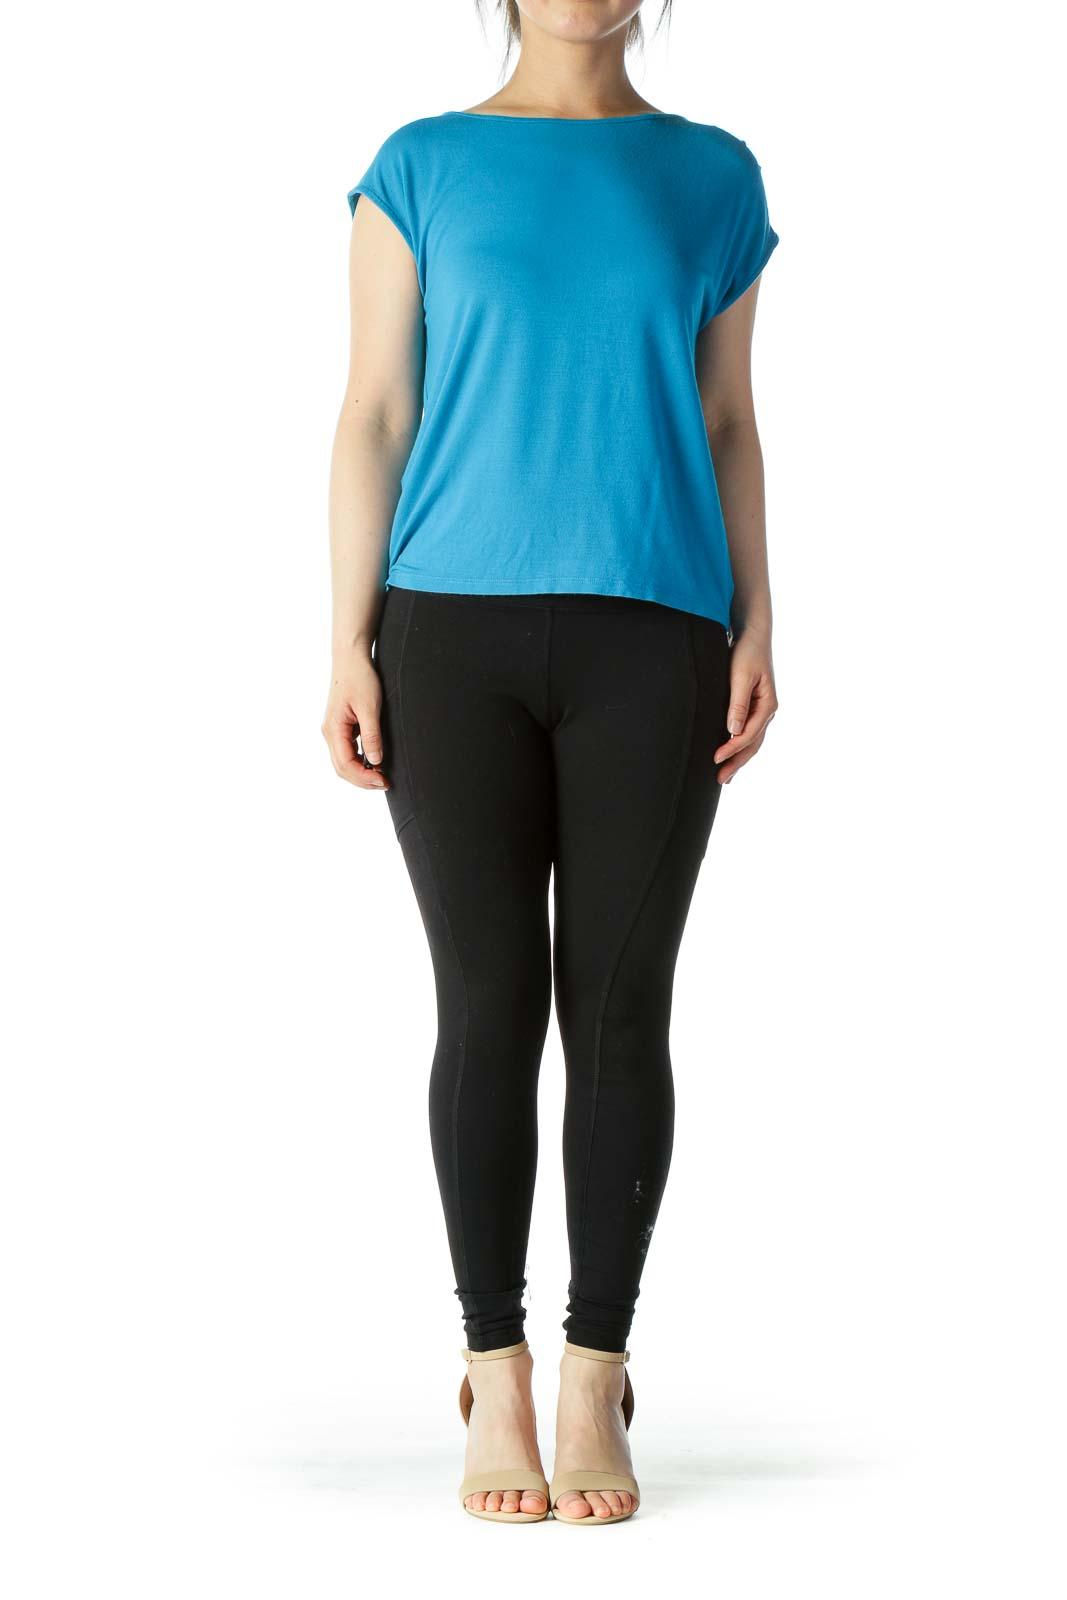 Bright Blue Short Sleeves Top